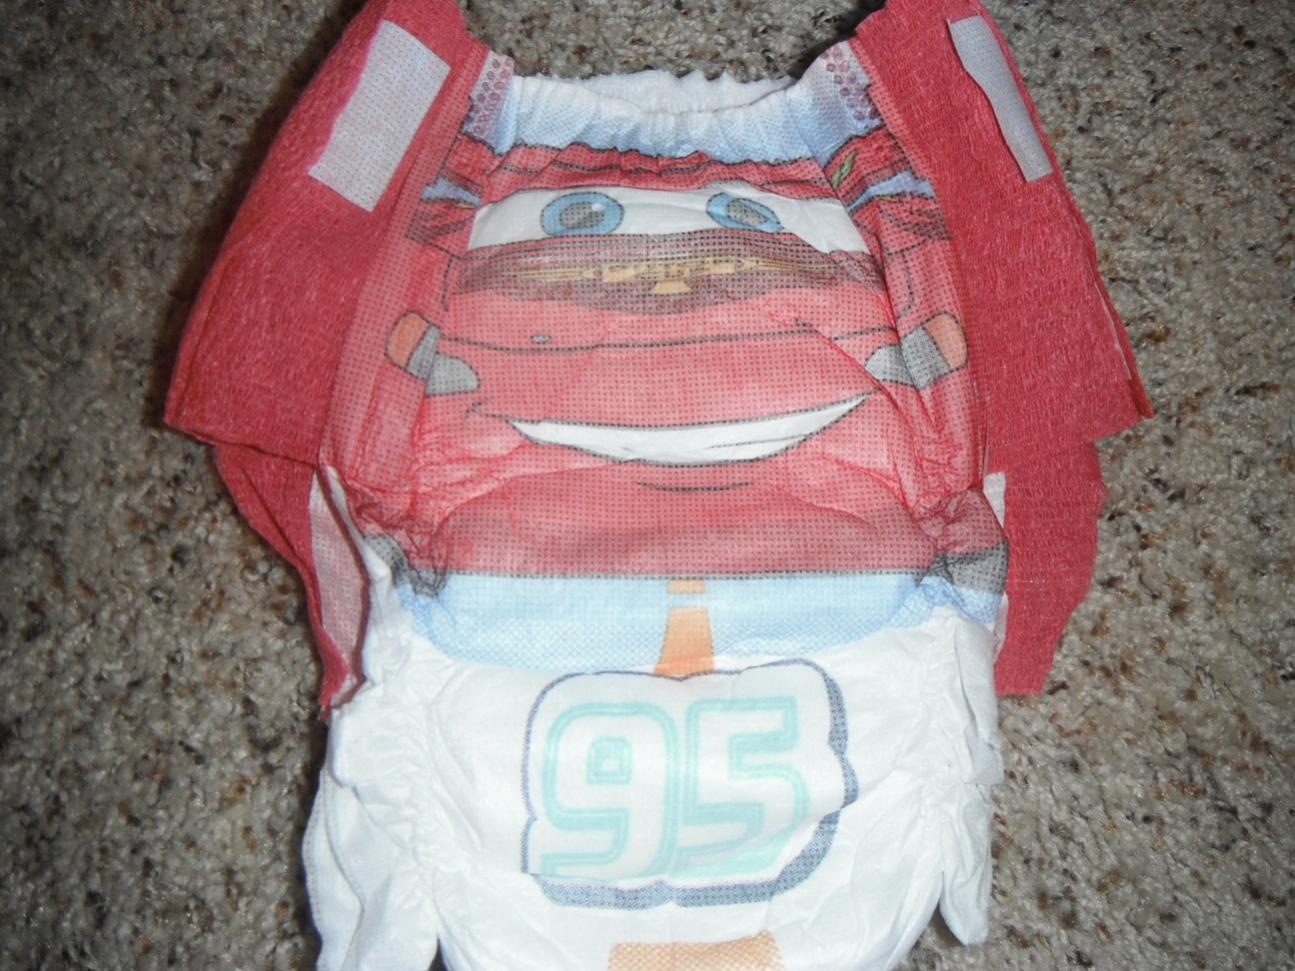 Huggies pull ups diapers car tuning - Teen Boy Pull Ups Diaper Car Pictures 1295x971